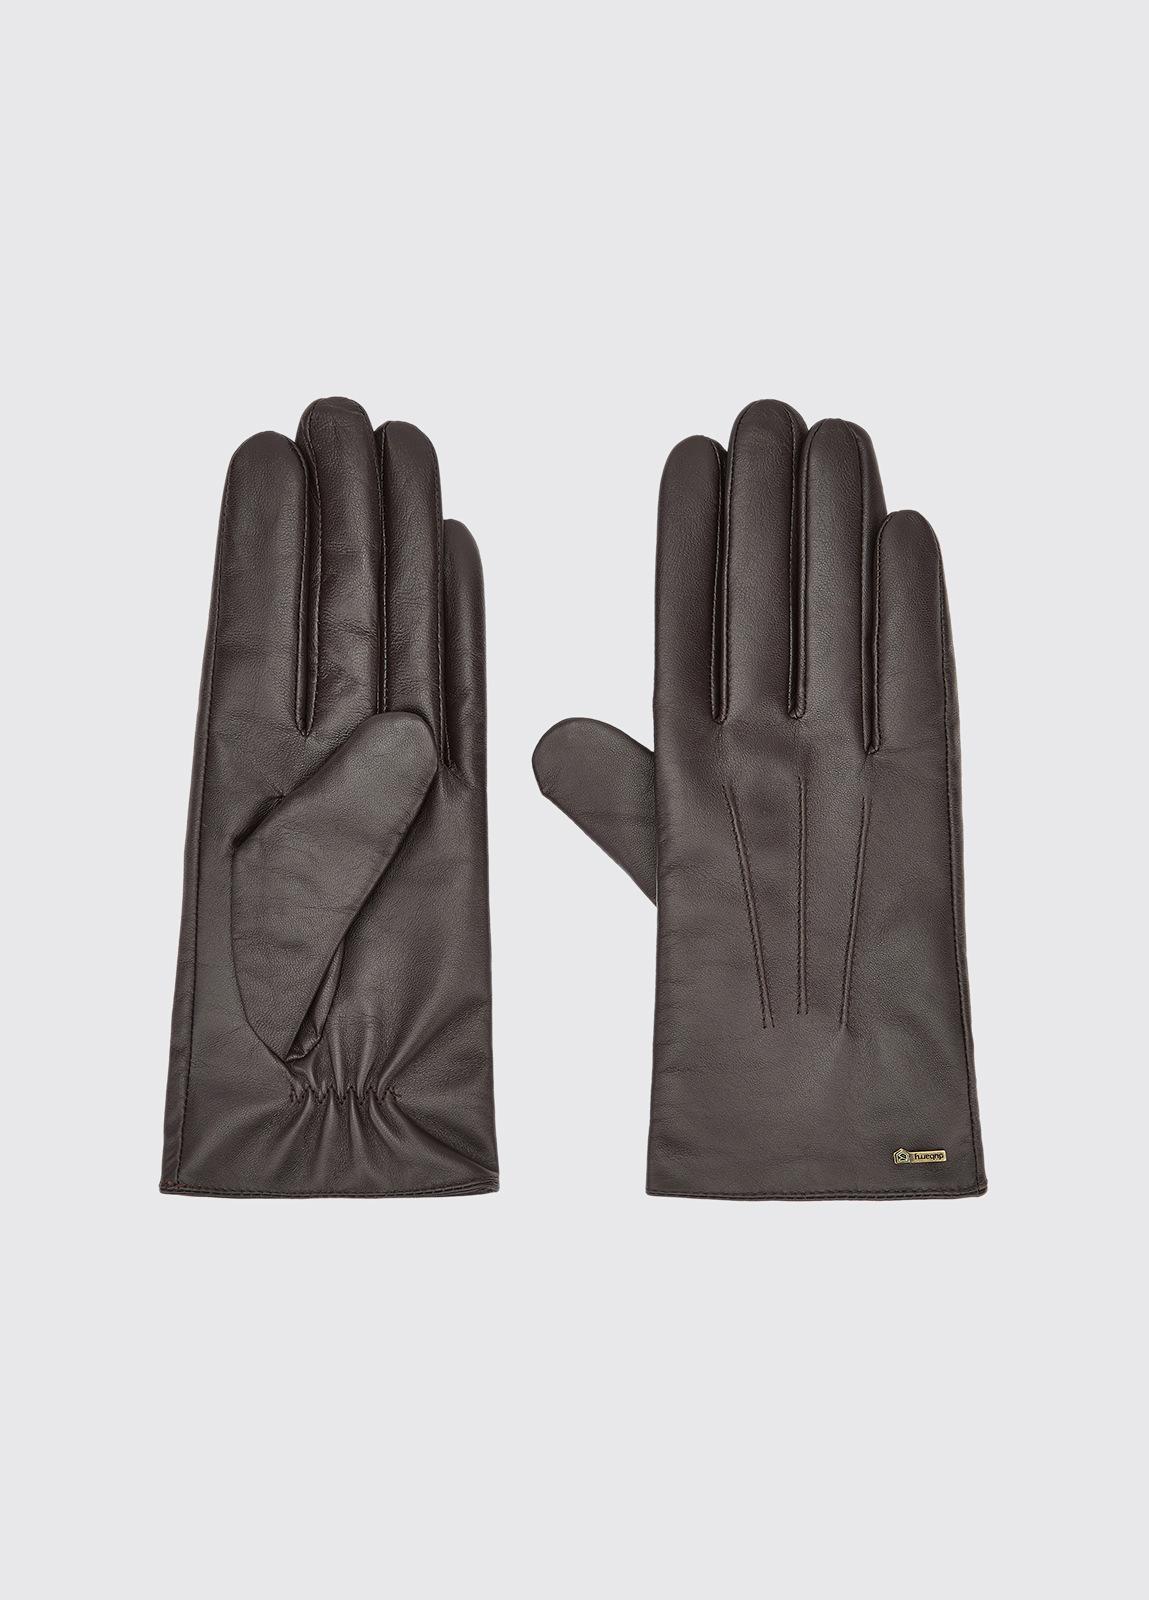 Sheehan Leather Gloves - Mahogany